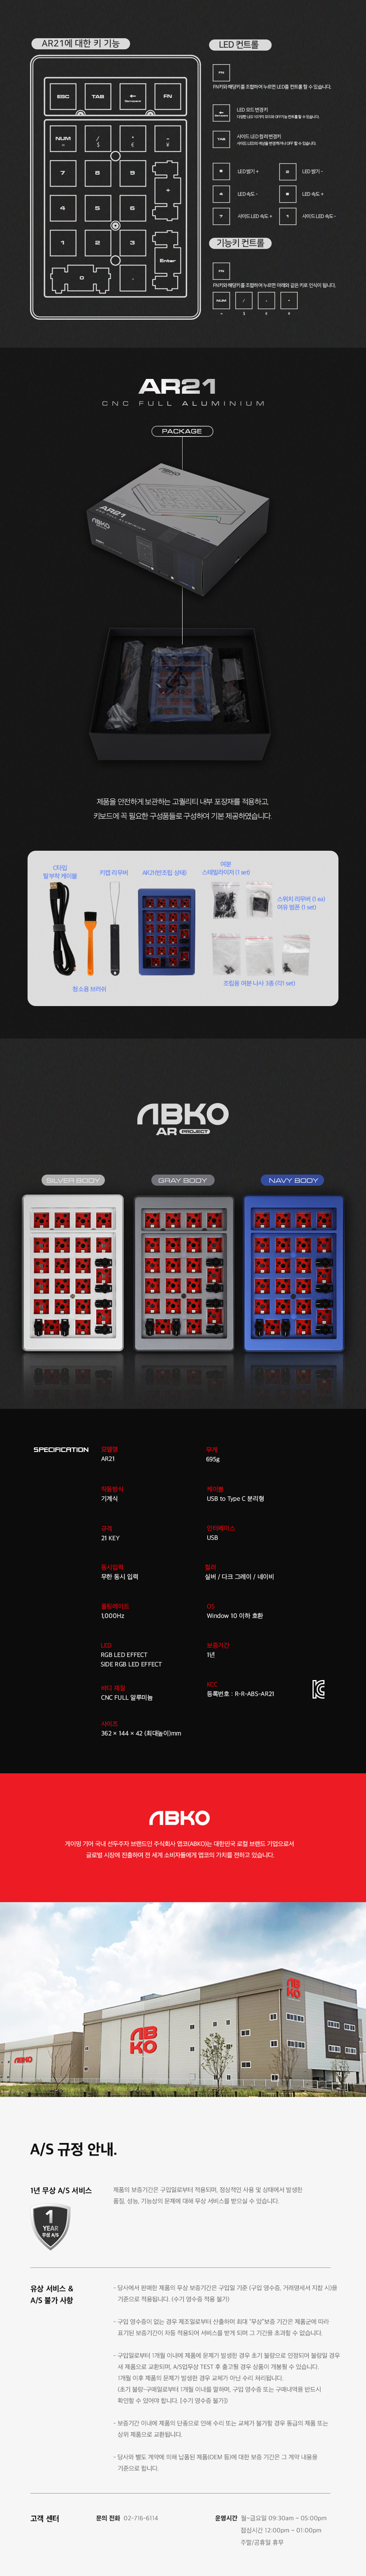 ABKO  AR21 CNC 풀 알루미늄 DIY KIT 넘버패드(그레이)